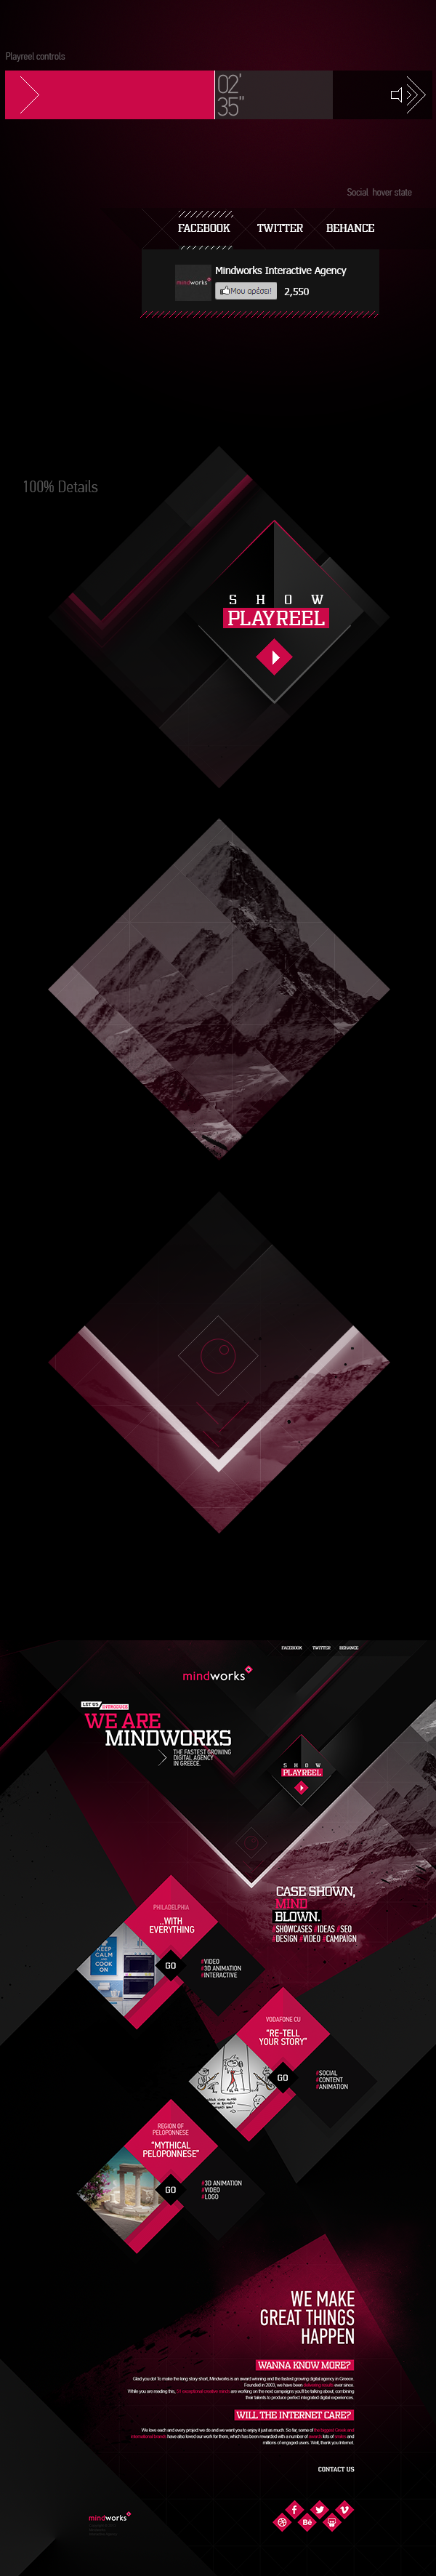 MindWorks microsite motion parallax html5 magenta